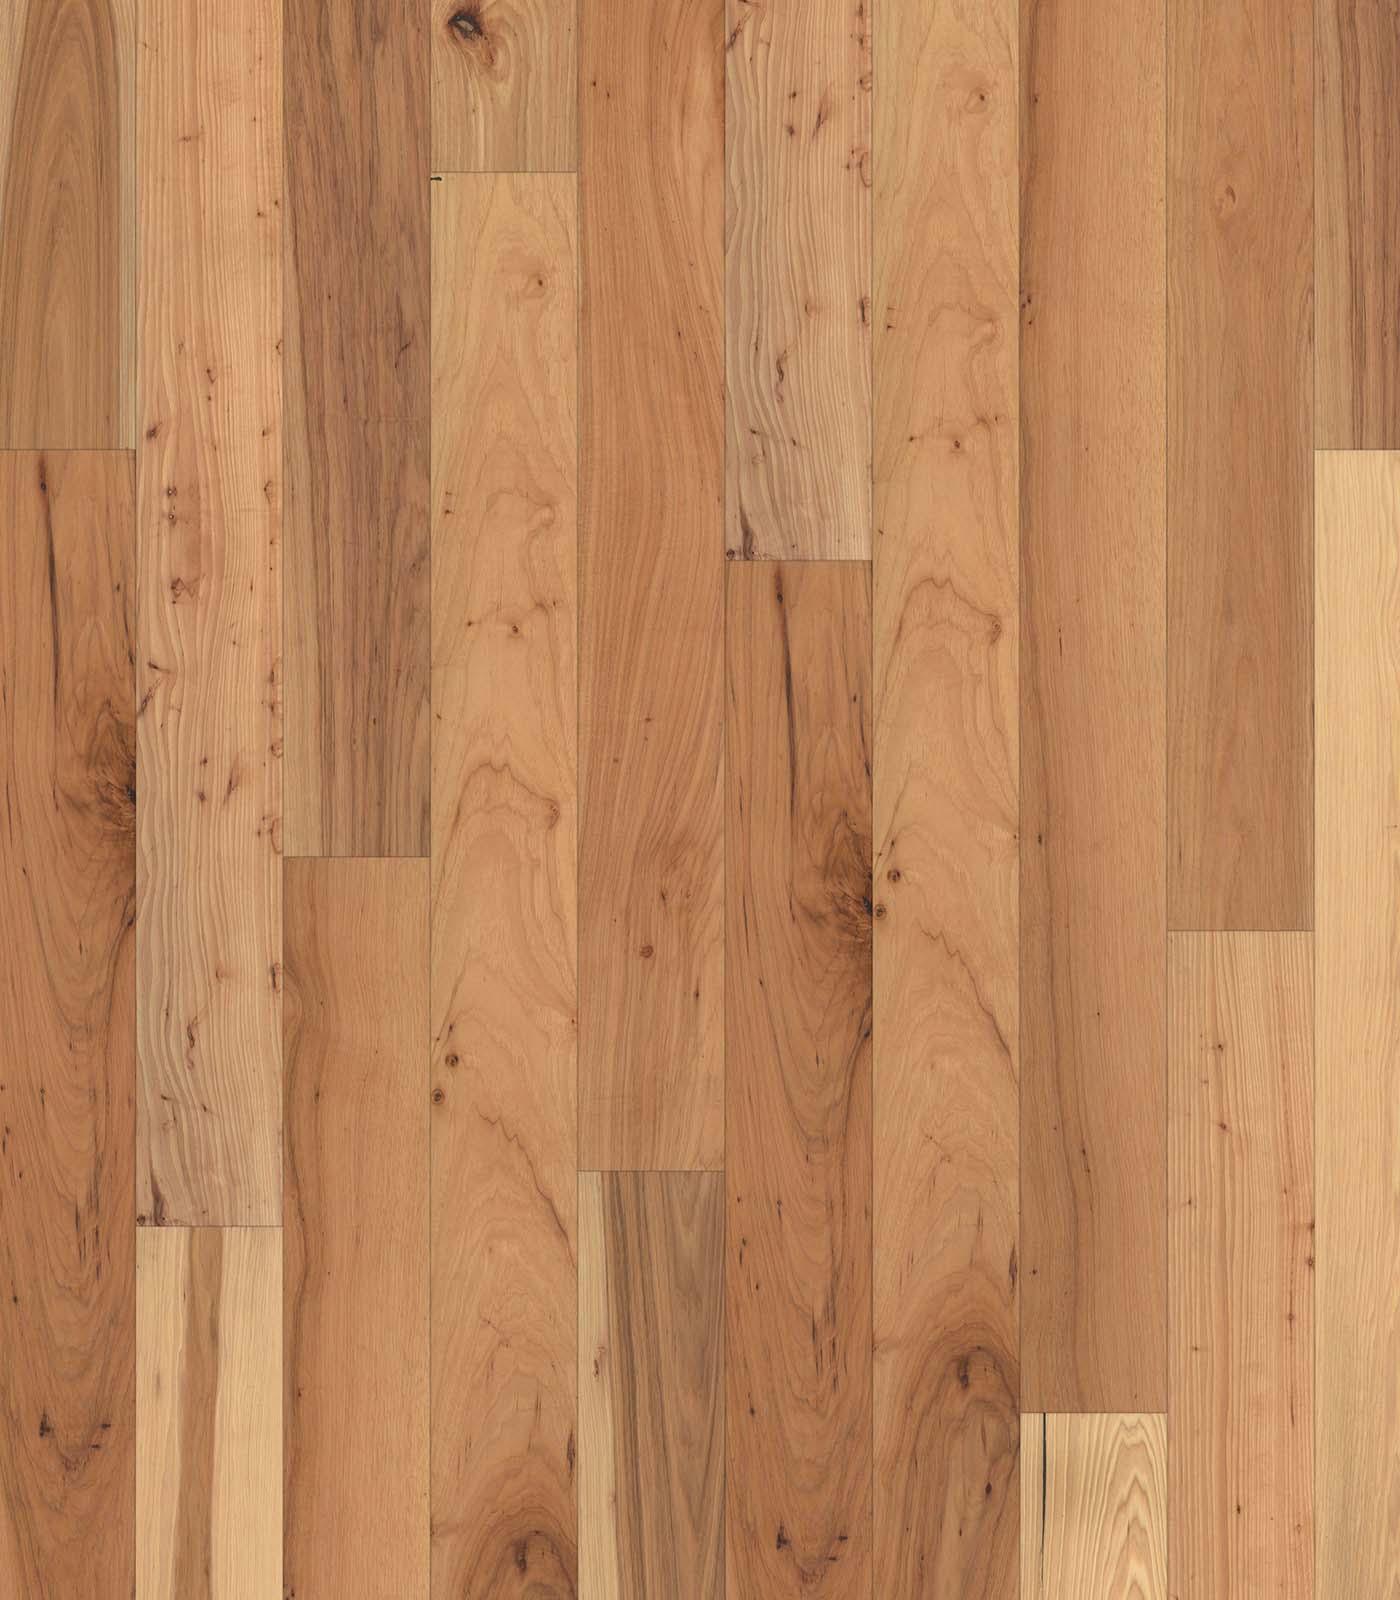 Pecan-engineered hardwood flooring